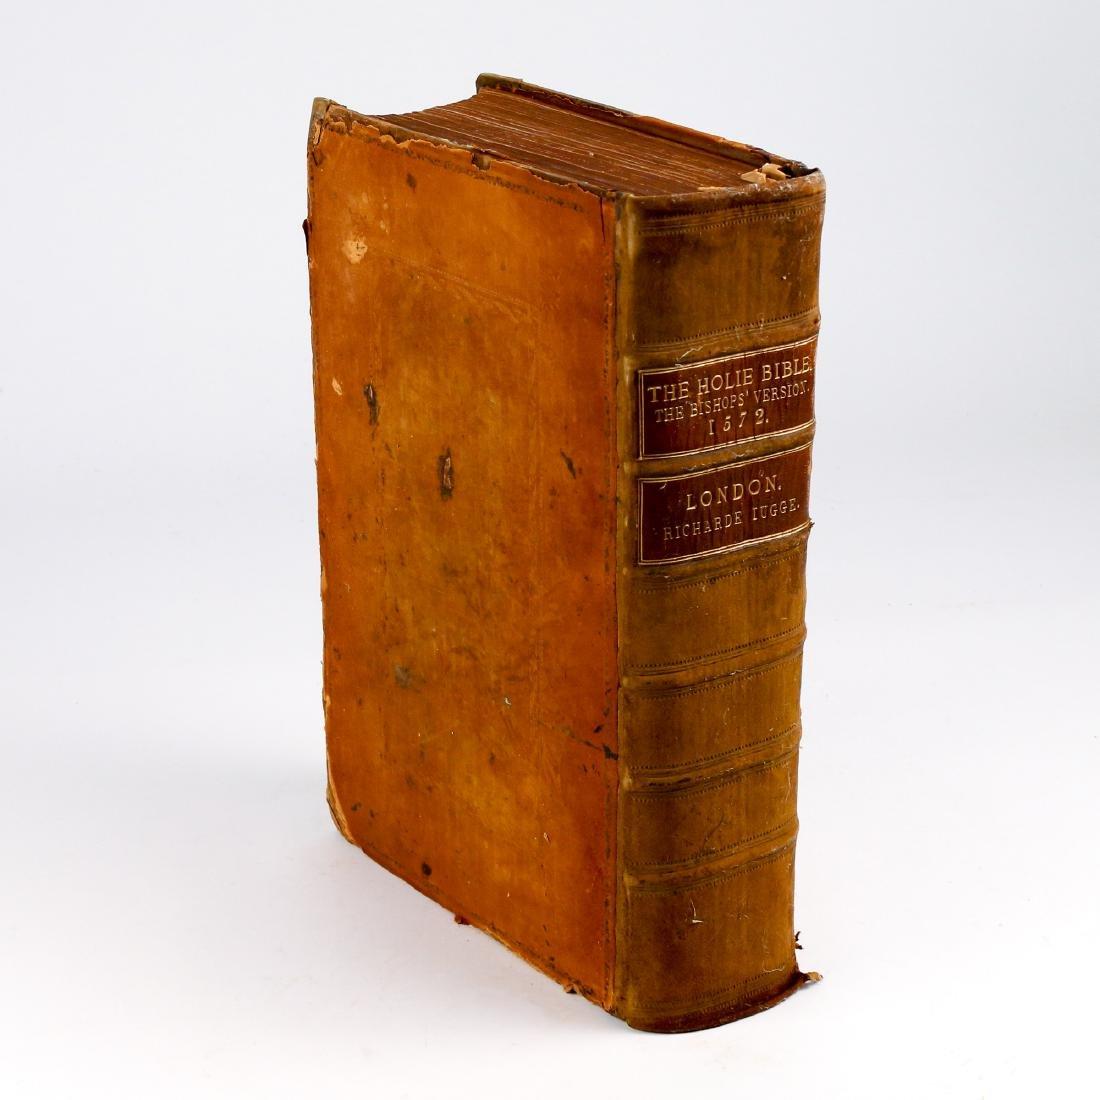 [FRANCIS FRY COPY] BISHOPS' BIBLE [1572] - 3